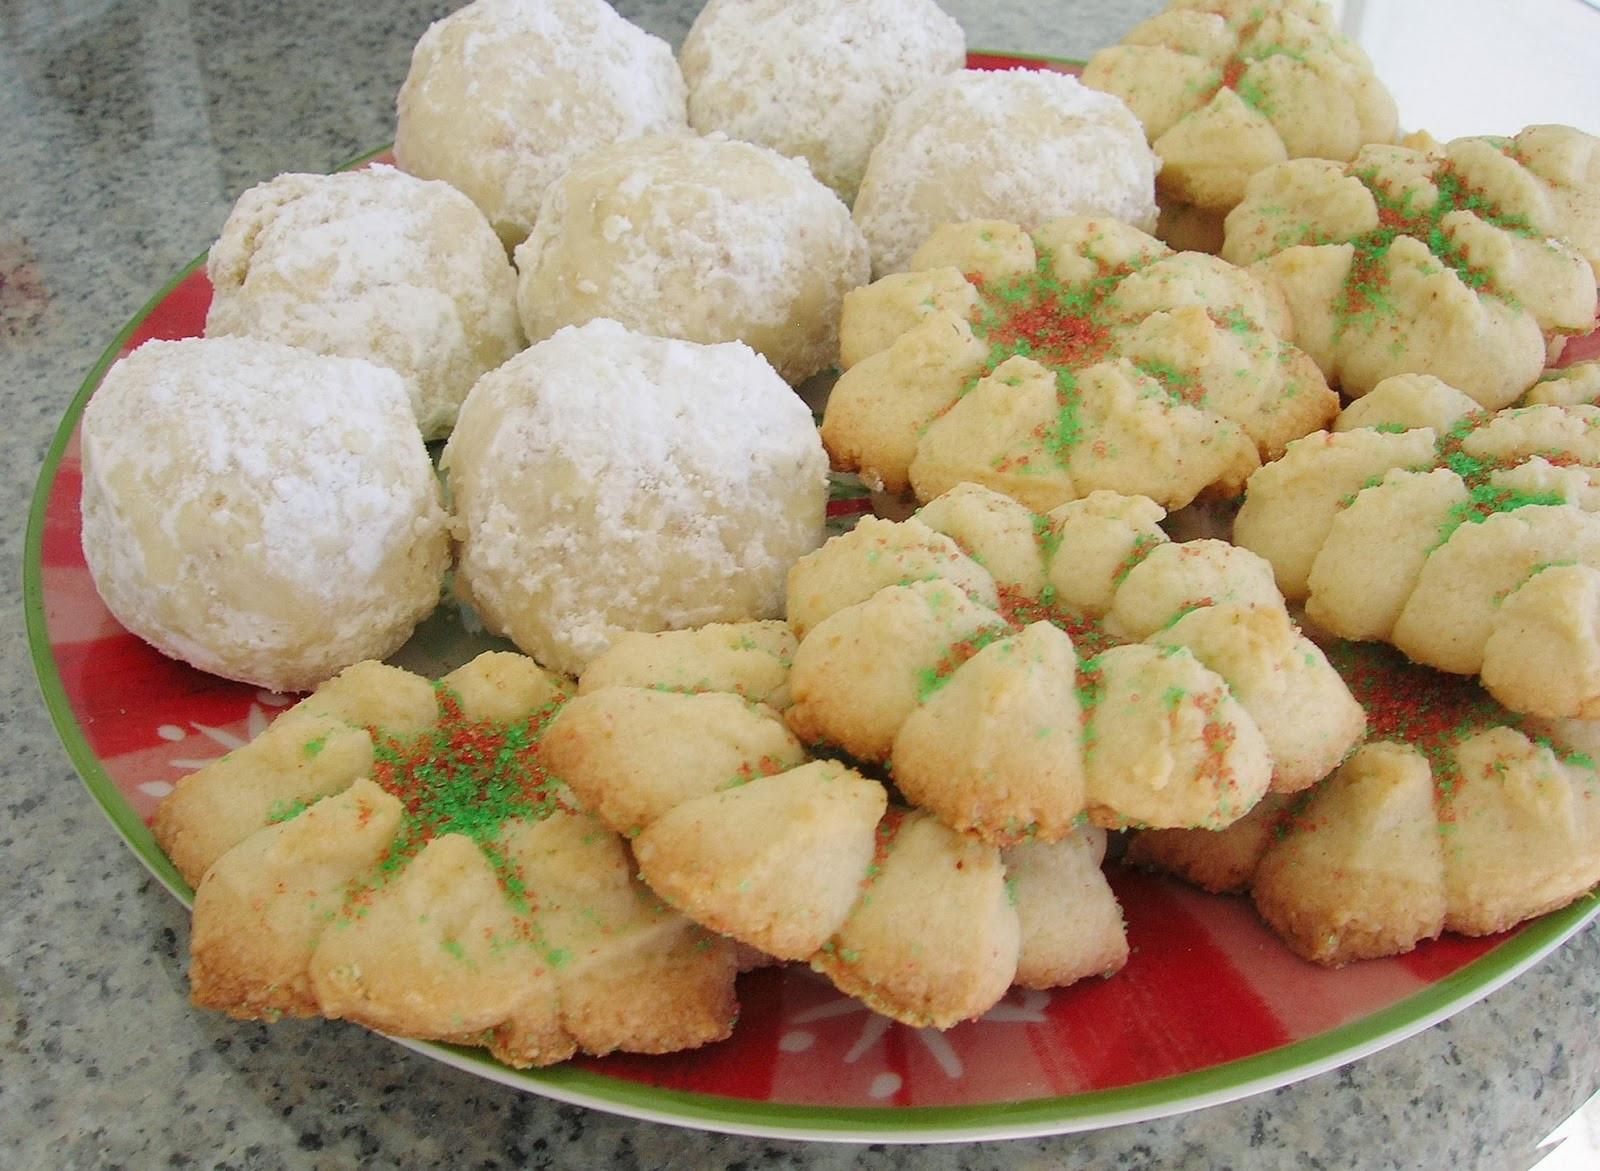 Gf Christmas Cookies  Skinny GF Chef Gluten Free Christmas Cookie Recipe Roundup